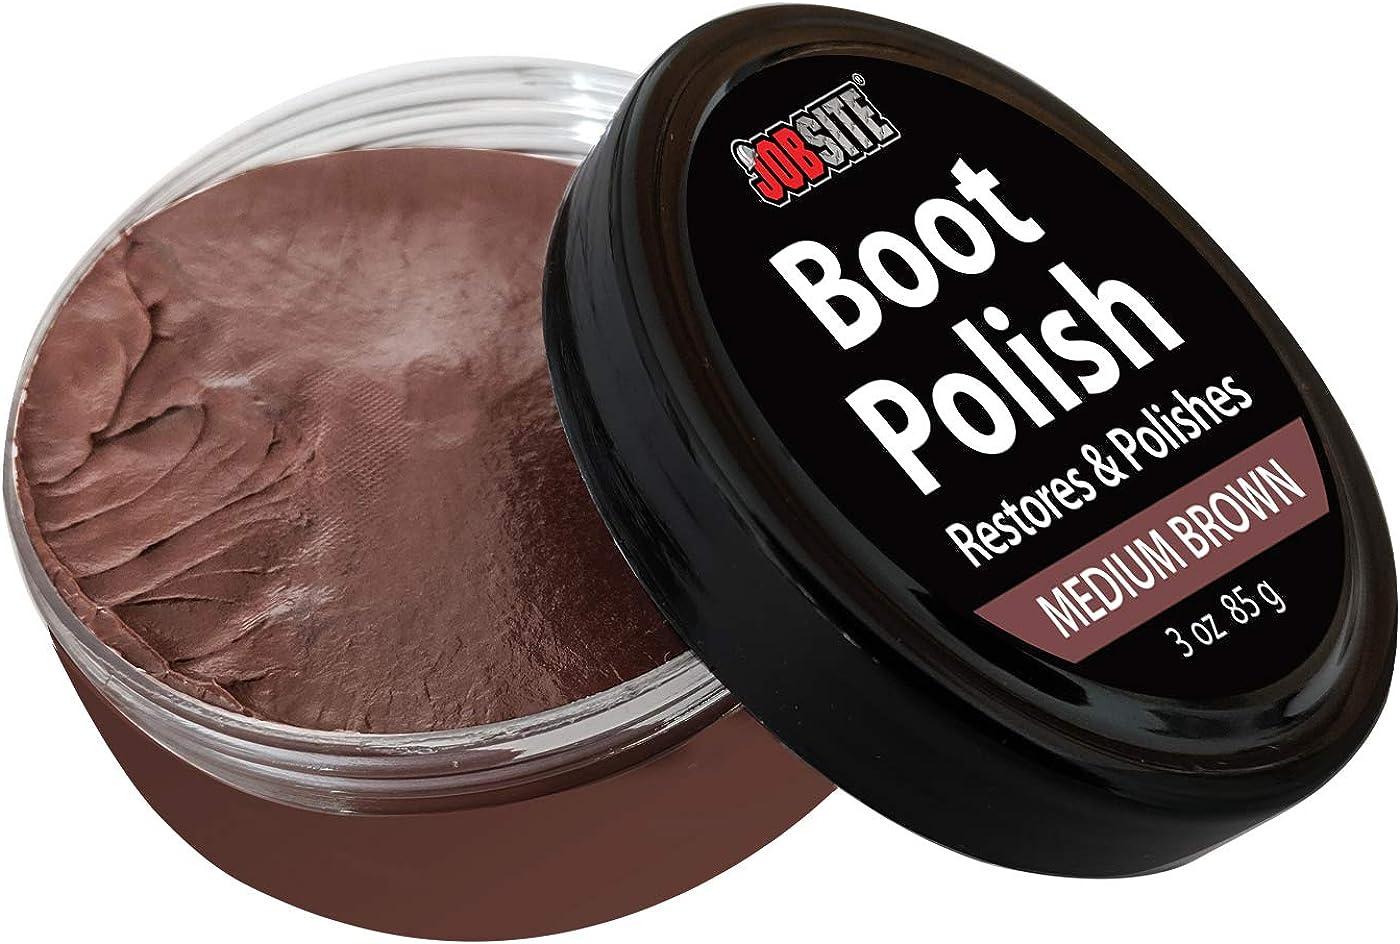 JobSite Premium Leather Boot & Shoe Polish Cream - Restores, Conditions & Polishes - 3 oz